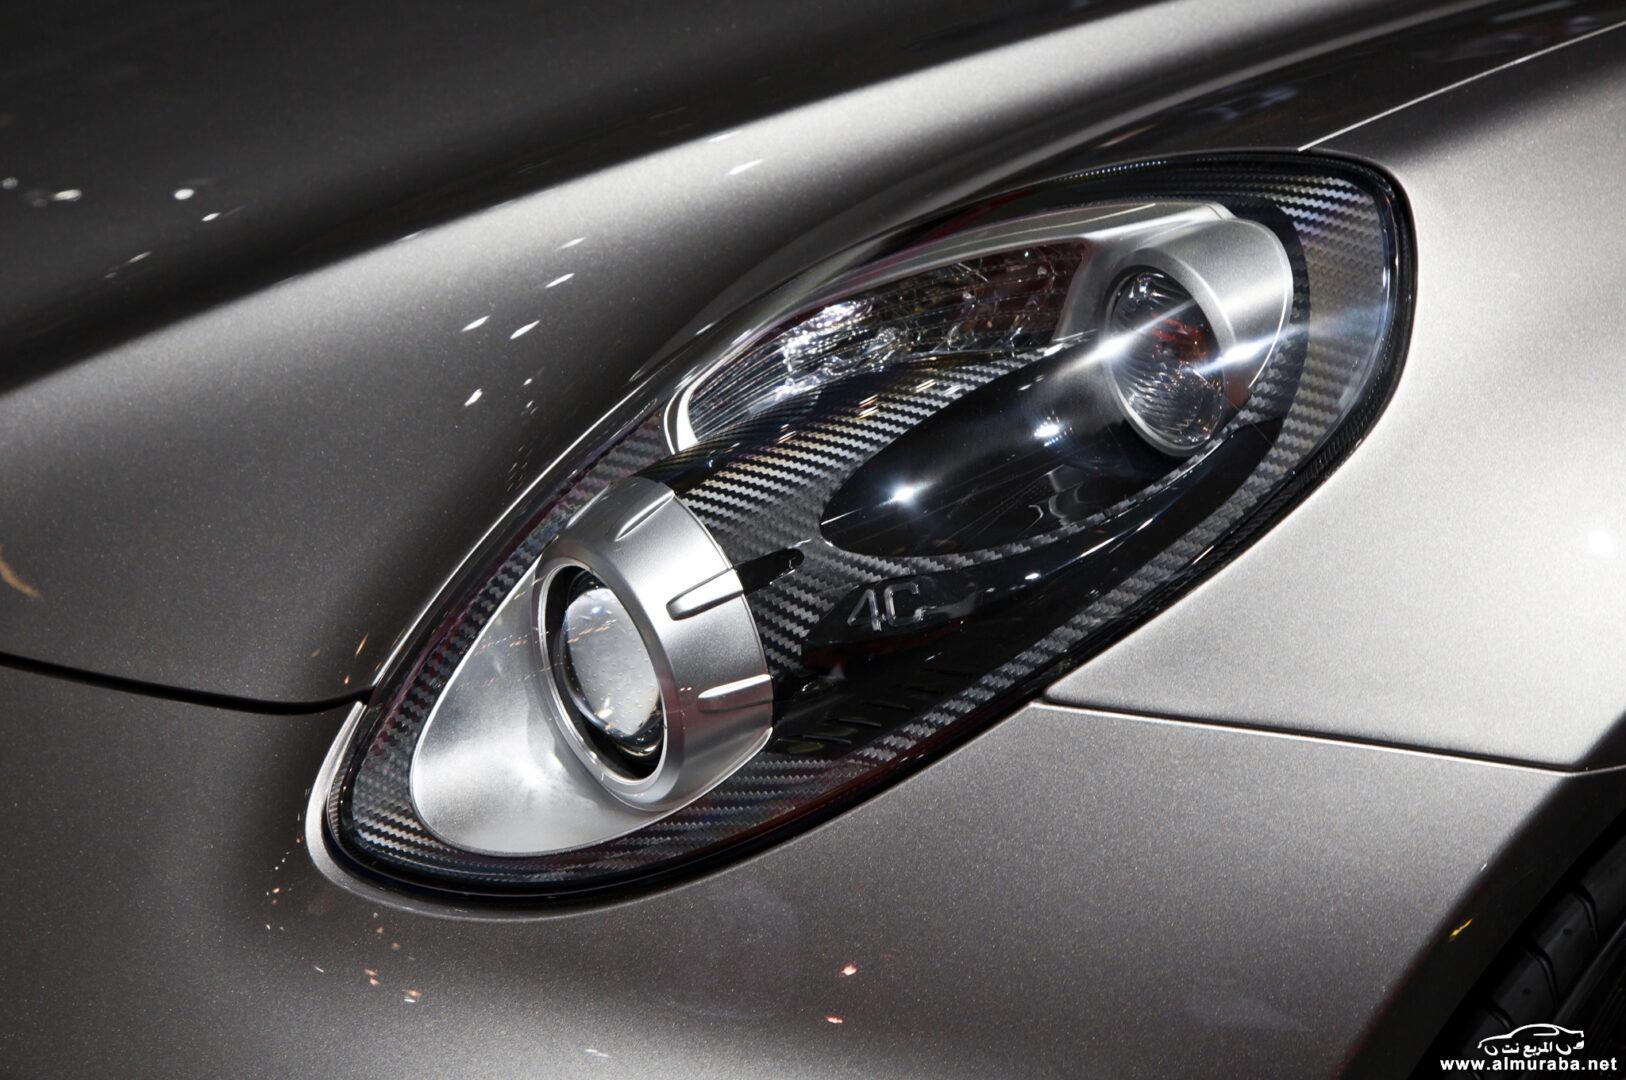 http---image.motortrend.com-f-wot-1404_2015_alfa_romeo_4c_launch_edition_arrives_this_june-72848046-2015-Alfa-Romeo-4C-Launch-Edition-headlamp-02